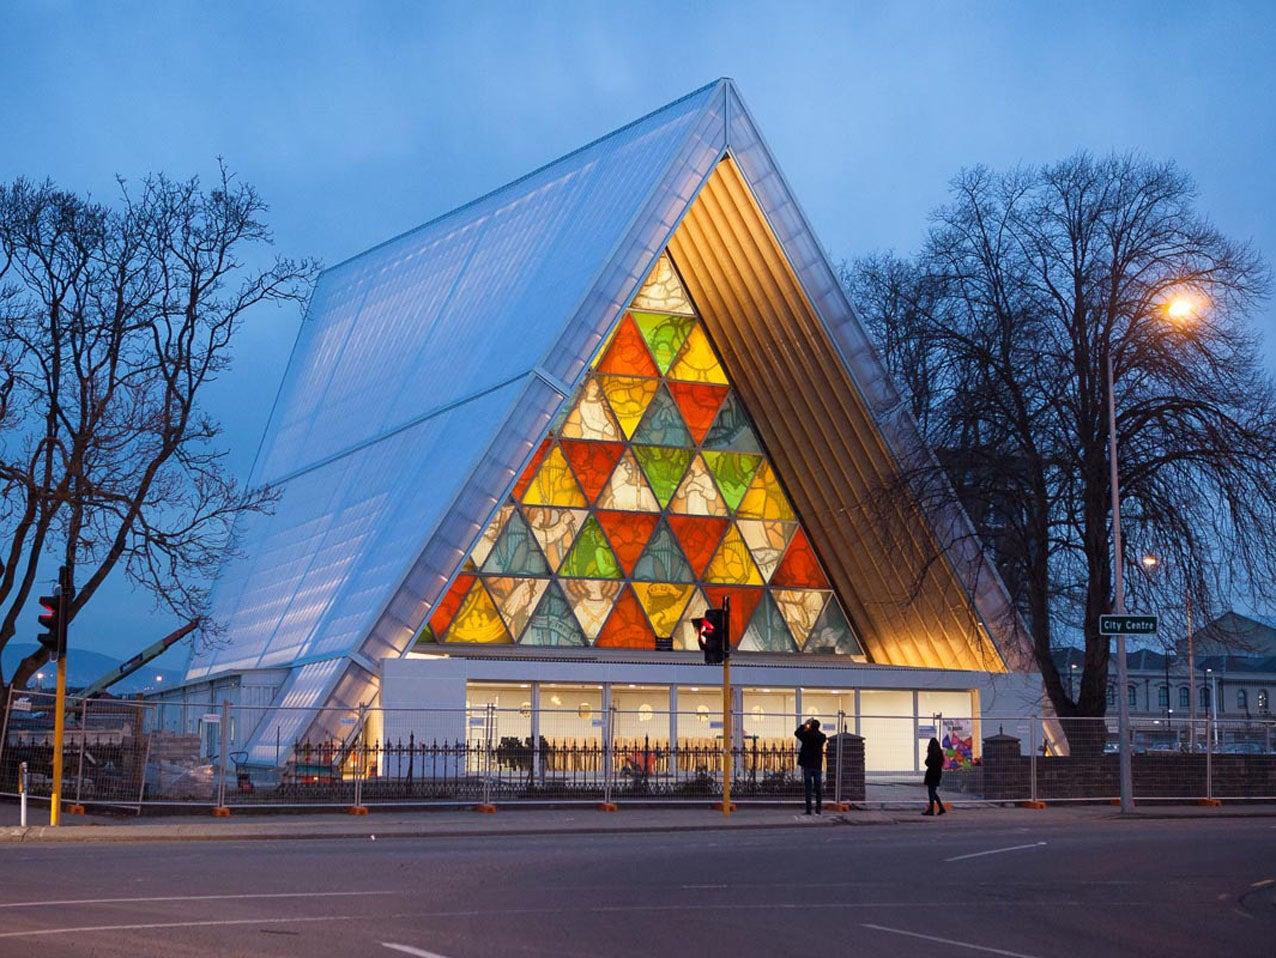 shigeru ban wins the pritzker prize architecture 39 s highest honour gizmodo australia. Black Bedroom Furniture Sets. Home Design Ideas